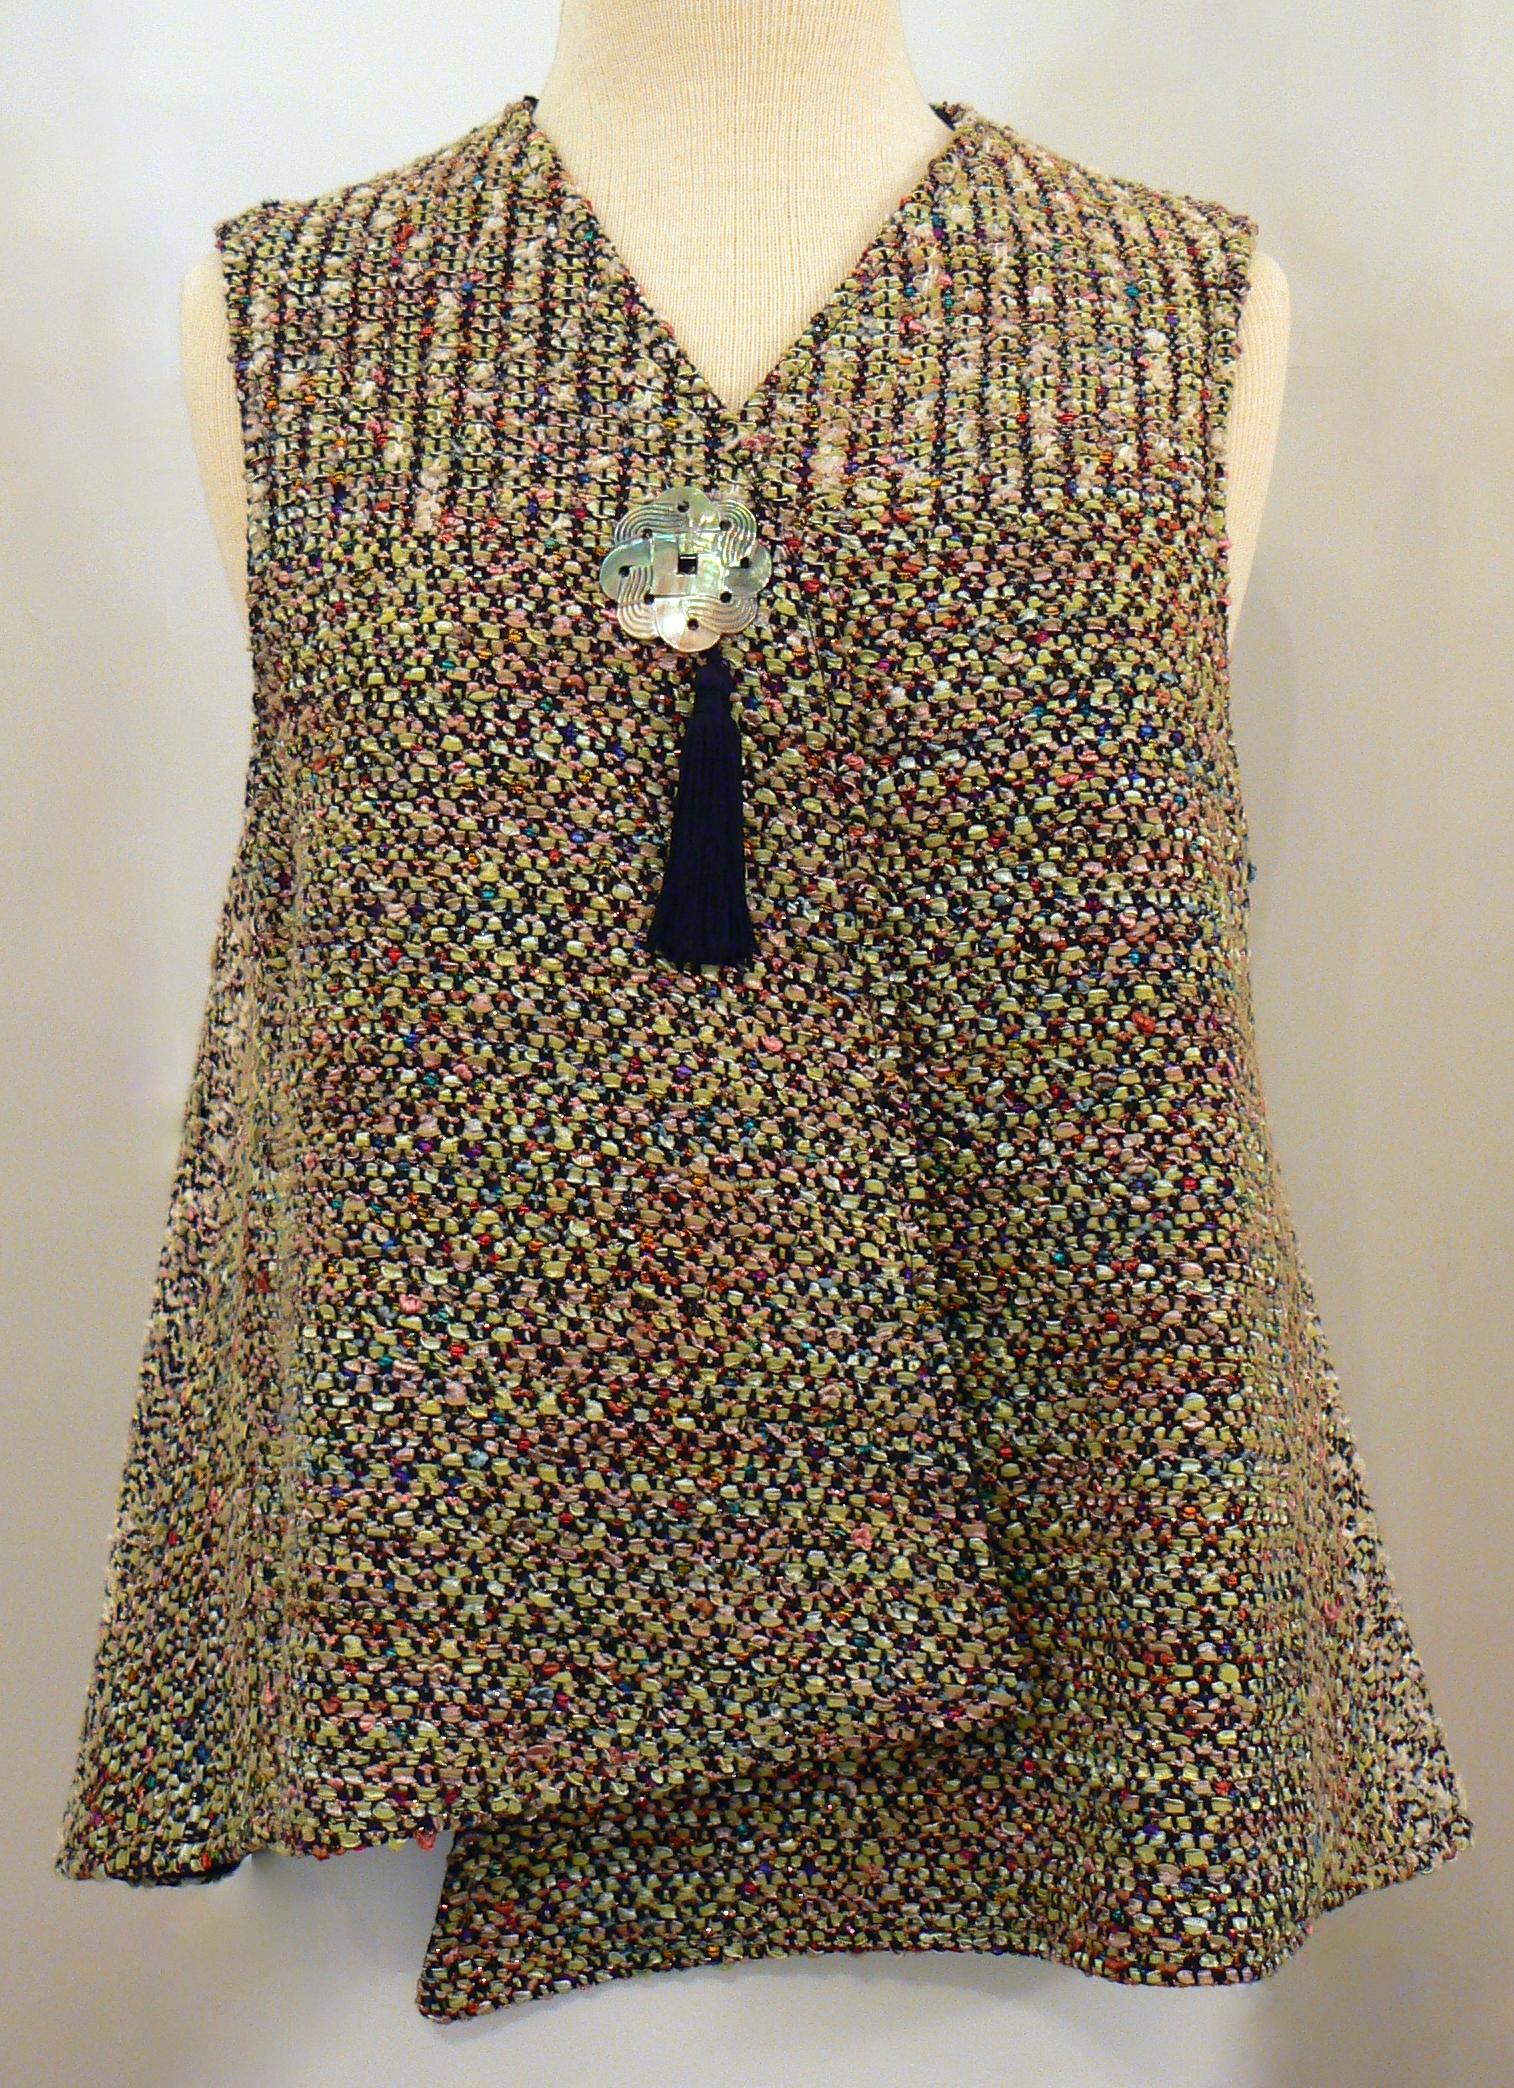 Handwoven Clothing, Vest, Kathleen Weir-West, 10-001.JPG